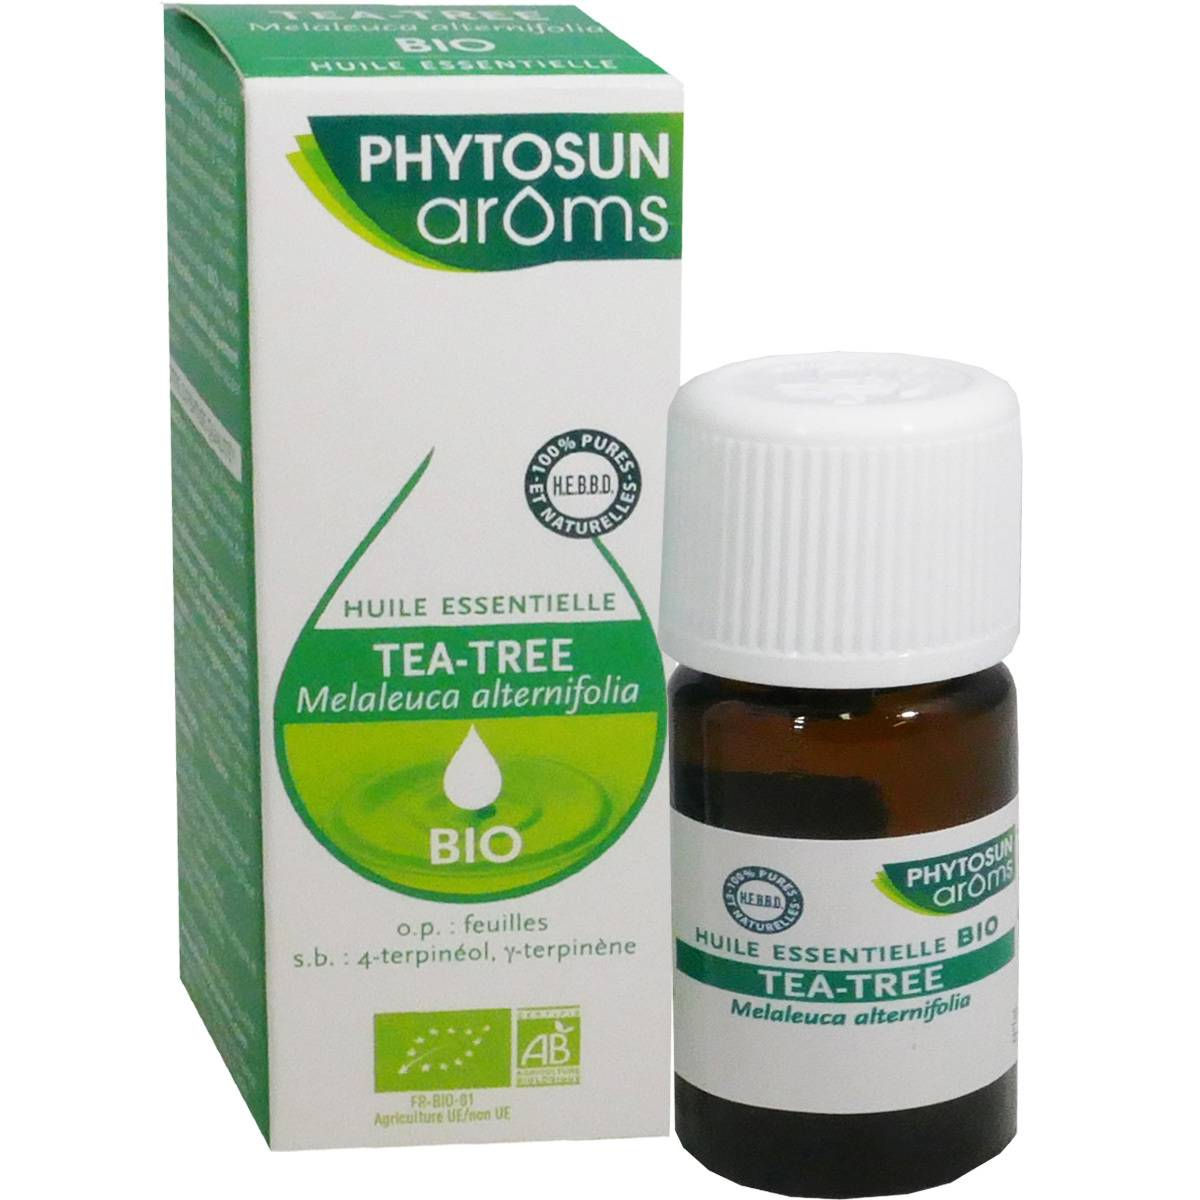 Phytosun aroms huile essentielle tea tree bio 10 ml